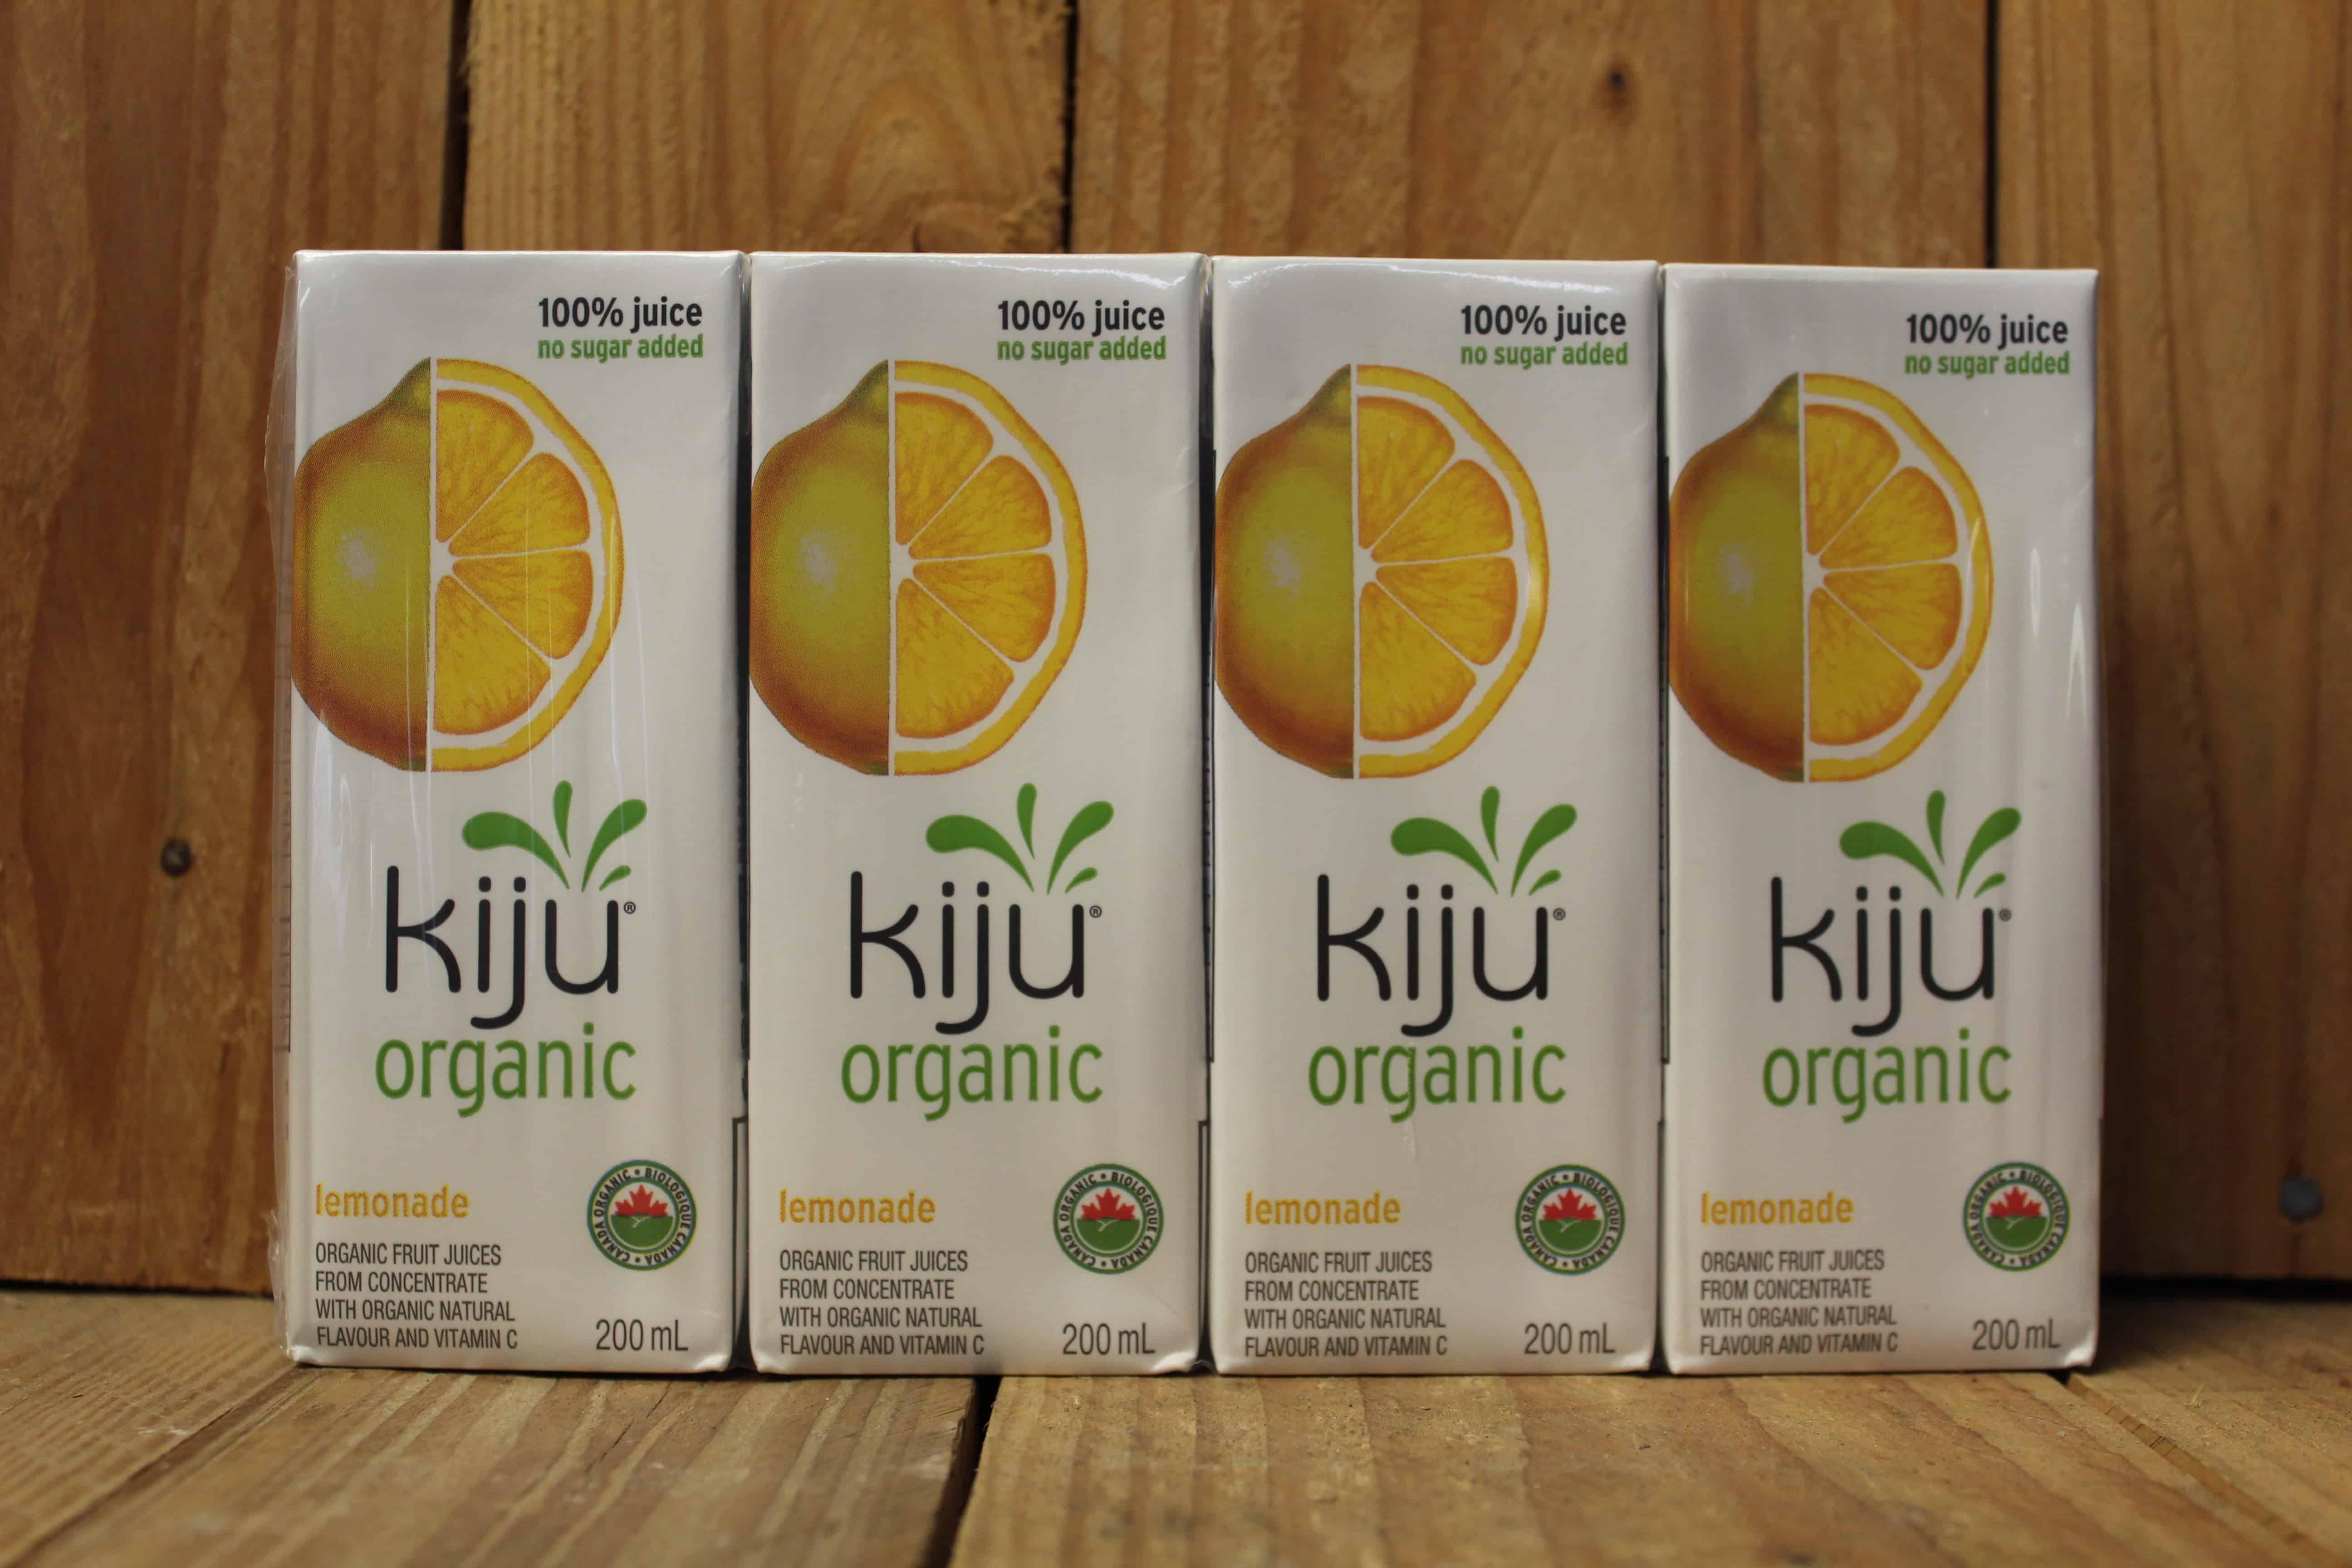 Kiju – Lemonade Juice (Pack of 4 – 200ml Cartons)